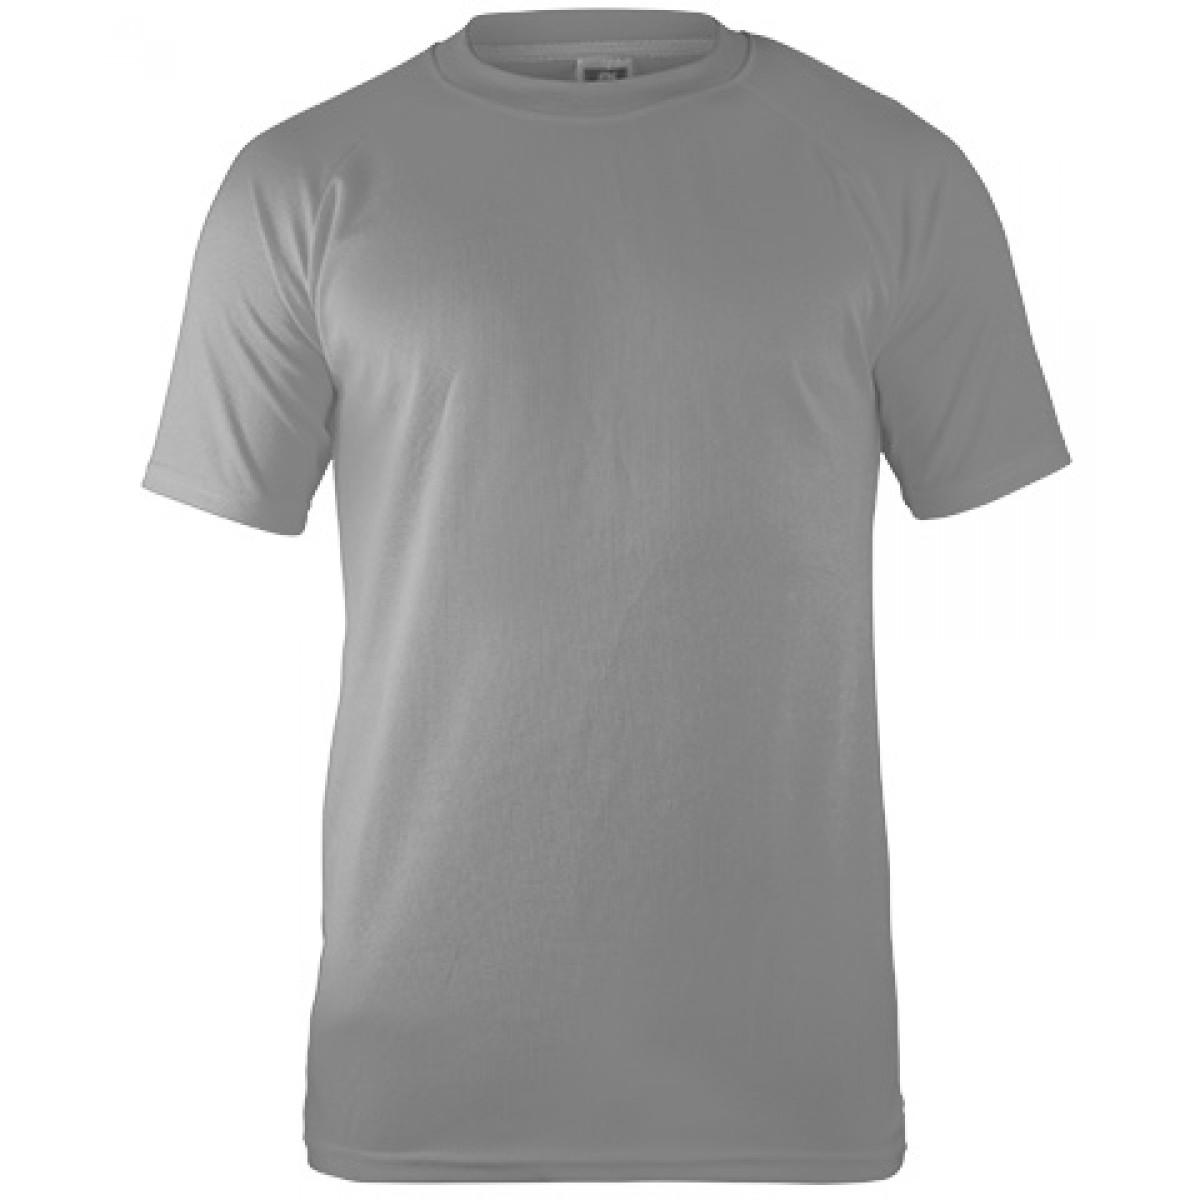 Performance T-shirt-Gray -M